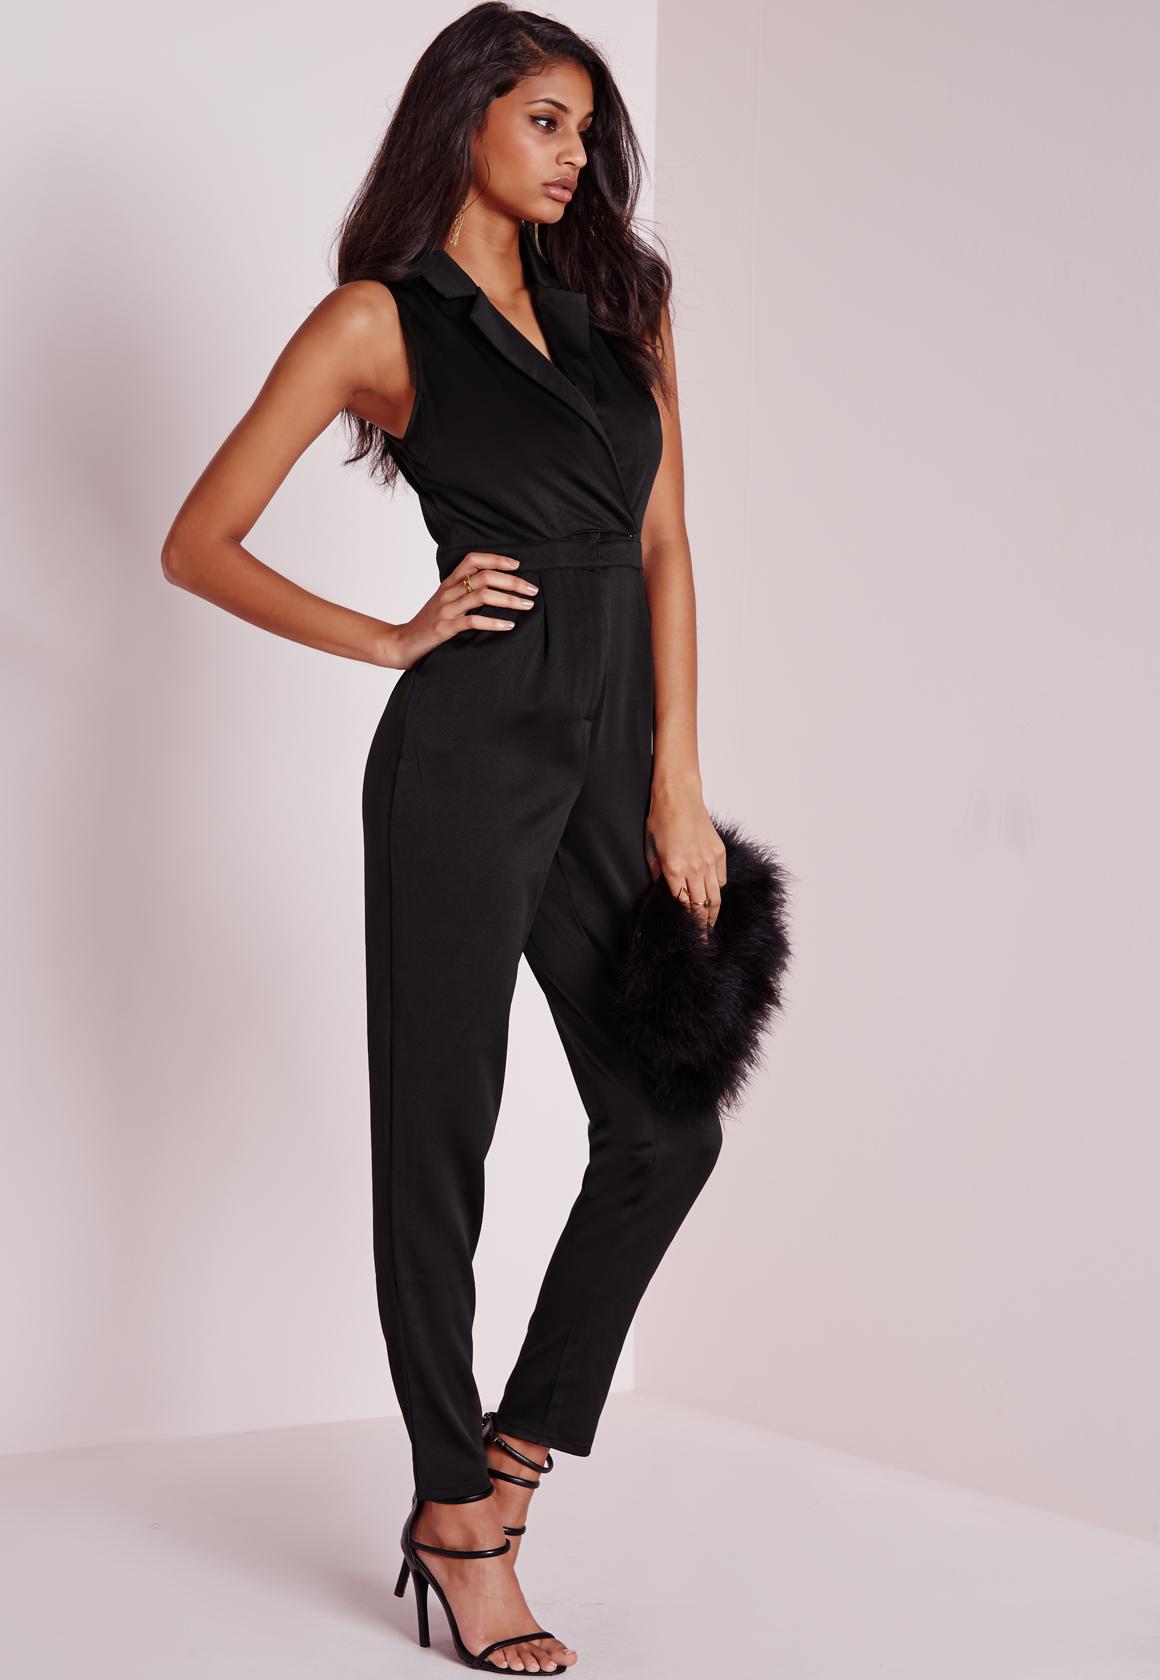 3b8e1fdcfac Lyst - Missguided Satin Tux Sleeveless Jumpsuit Black in Black